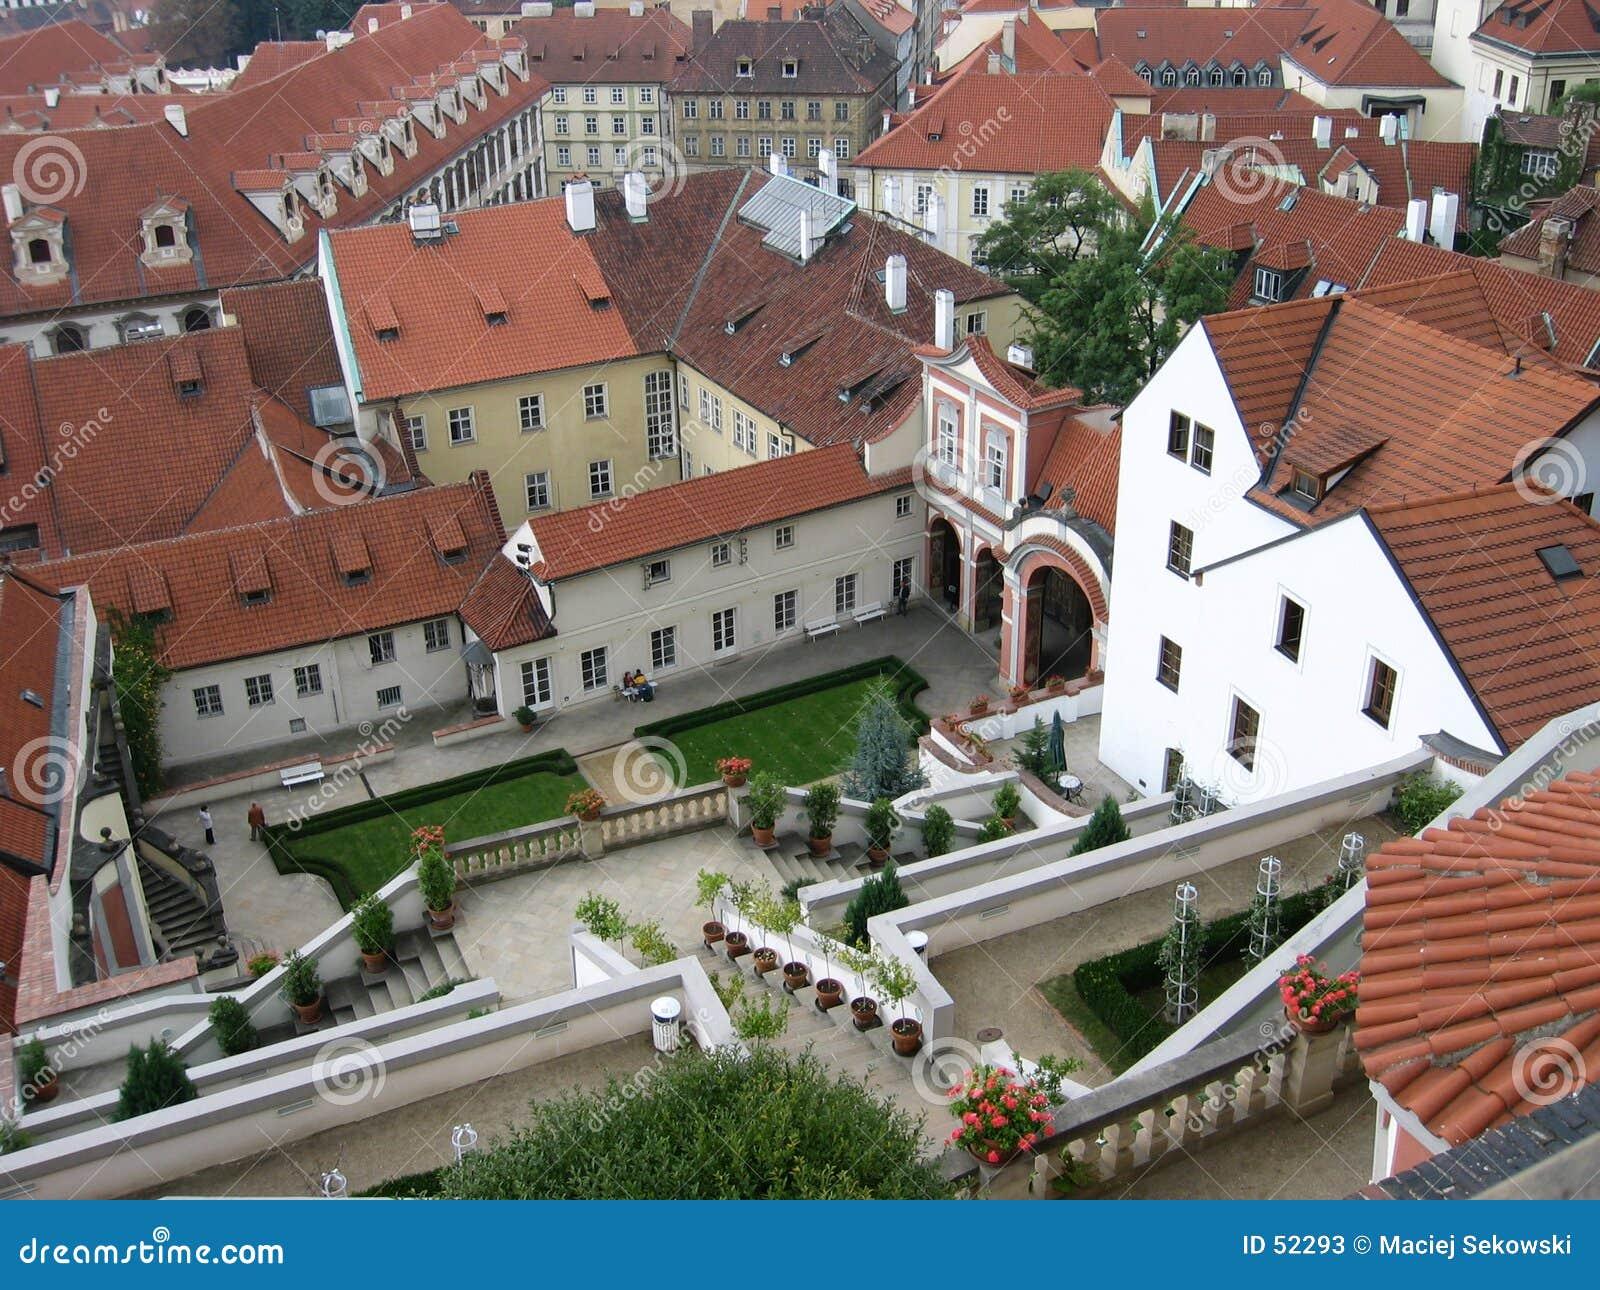 Download Prague couvre II image stock. Image du ciel, toit, home - 52293